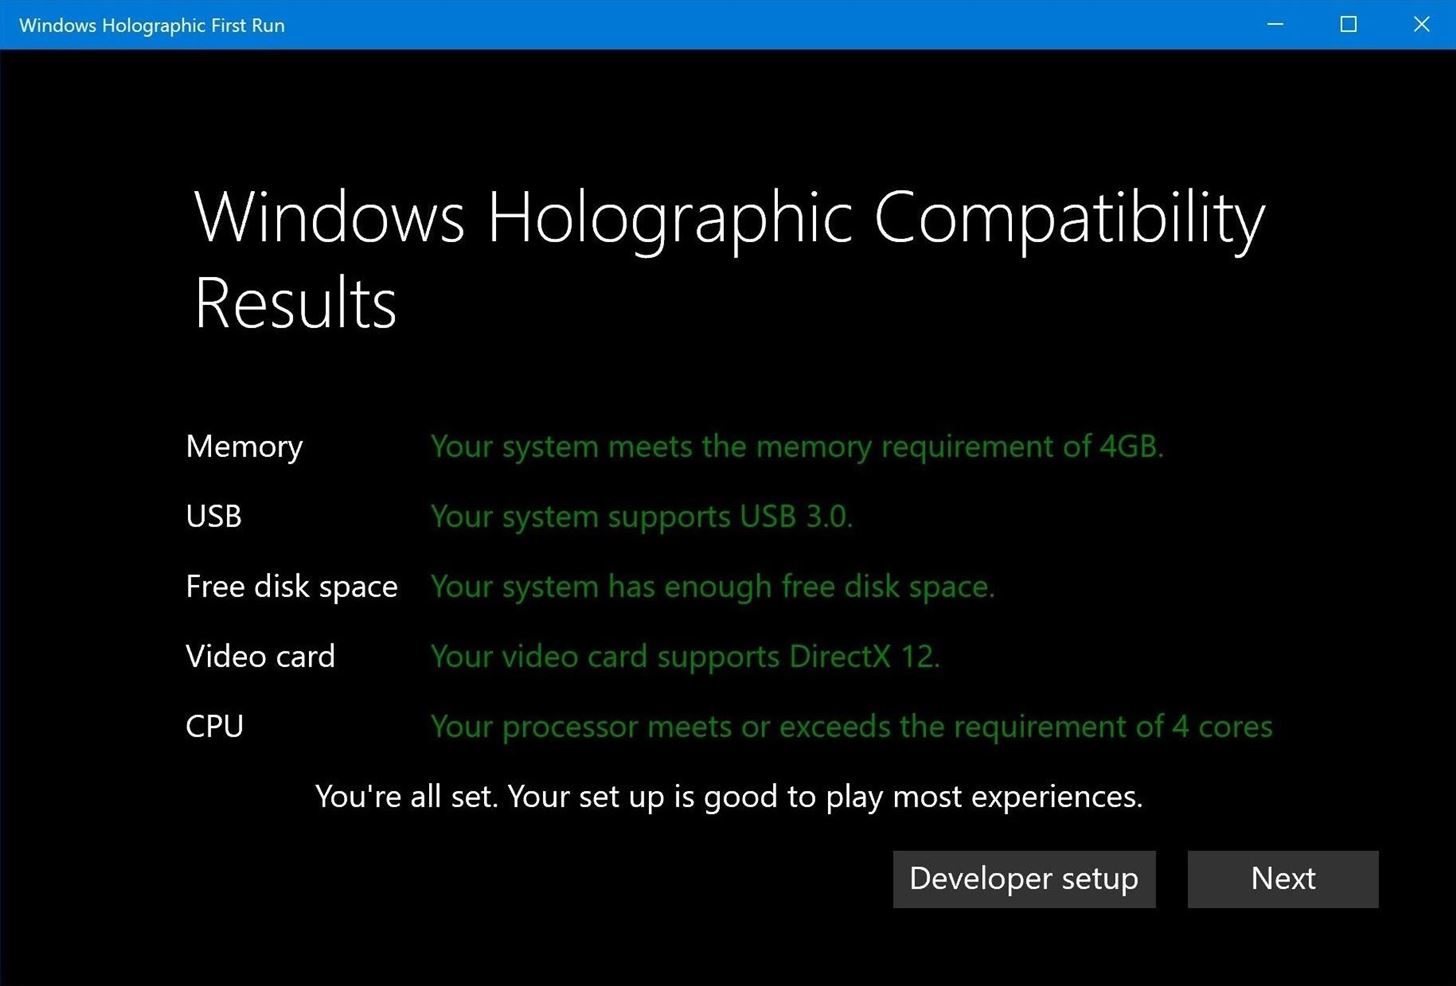 Windows Holographic Lands in Windows 10 Insider Build 14971